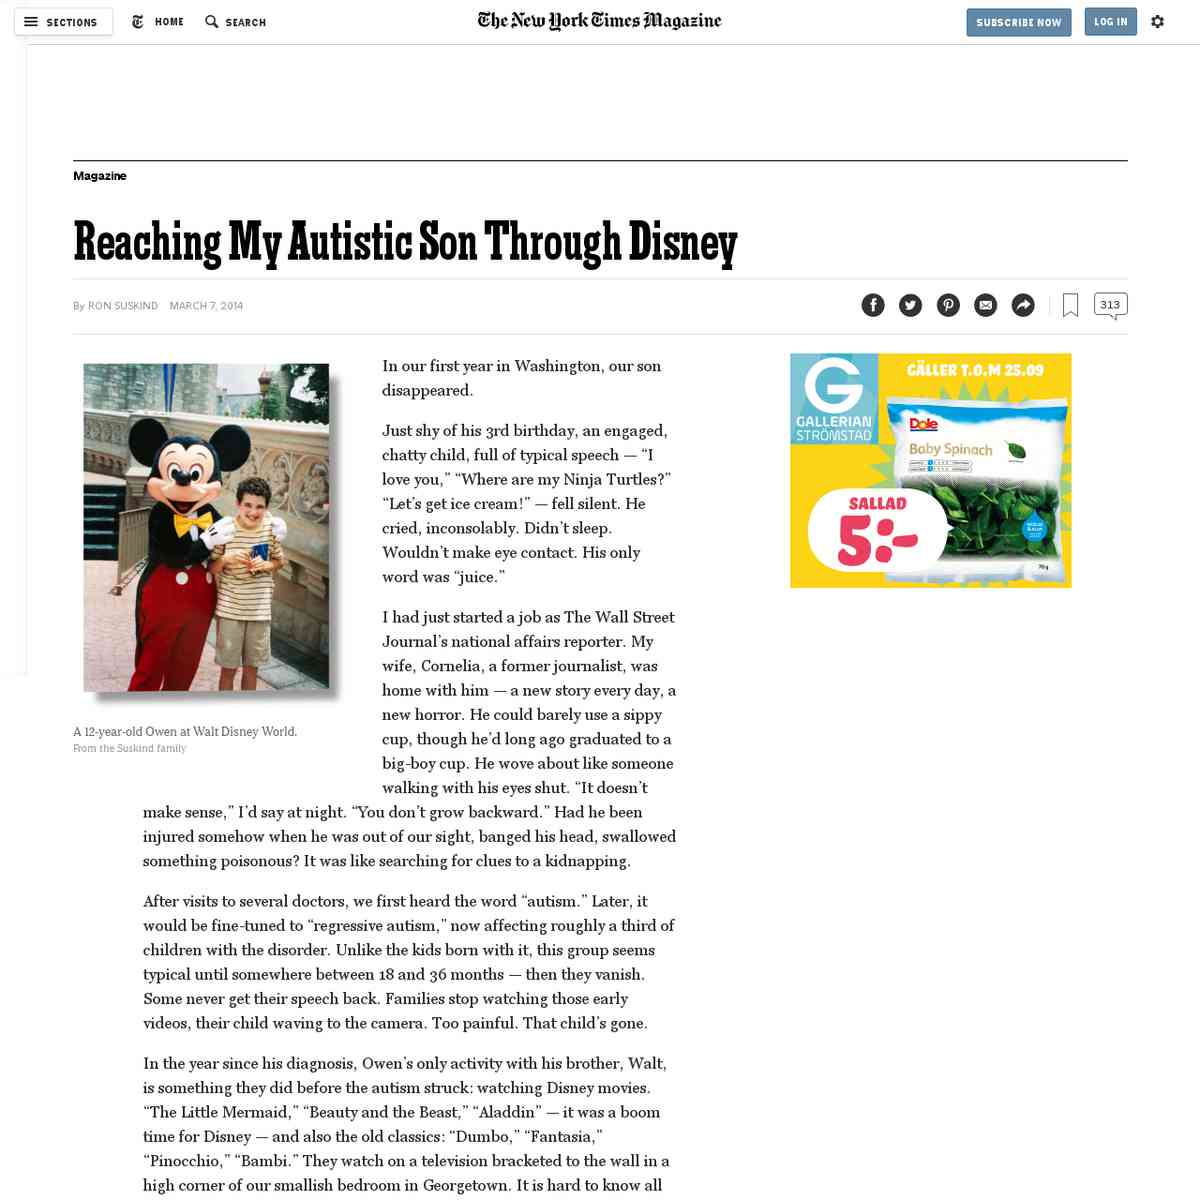 Reaching My Autistic Son Through Disney - NYTimes.com